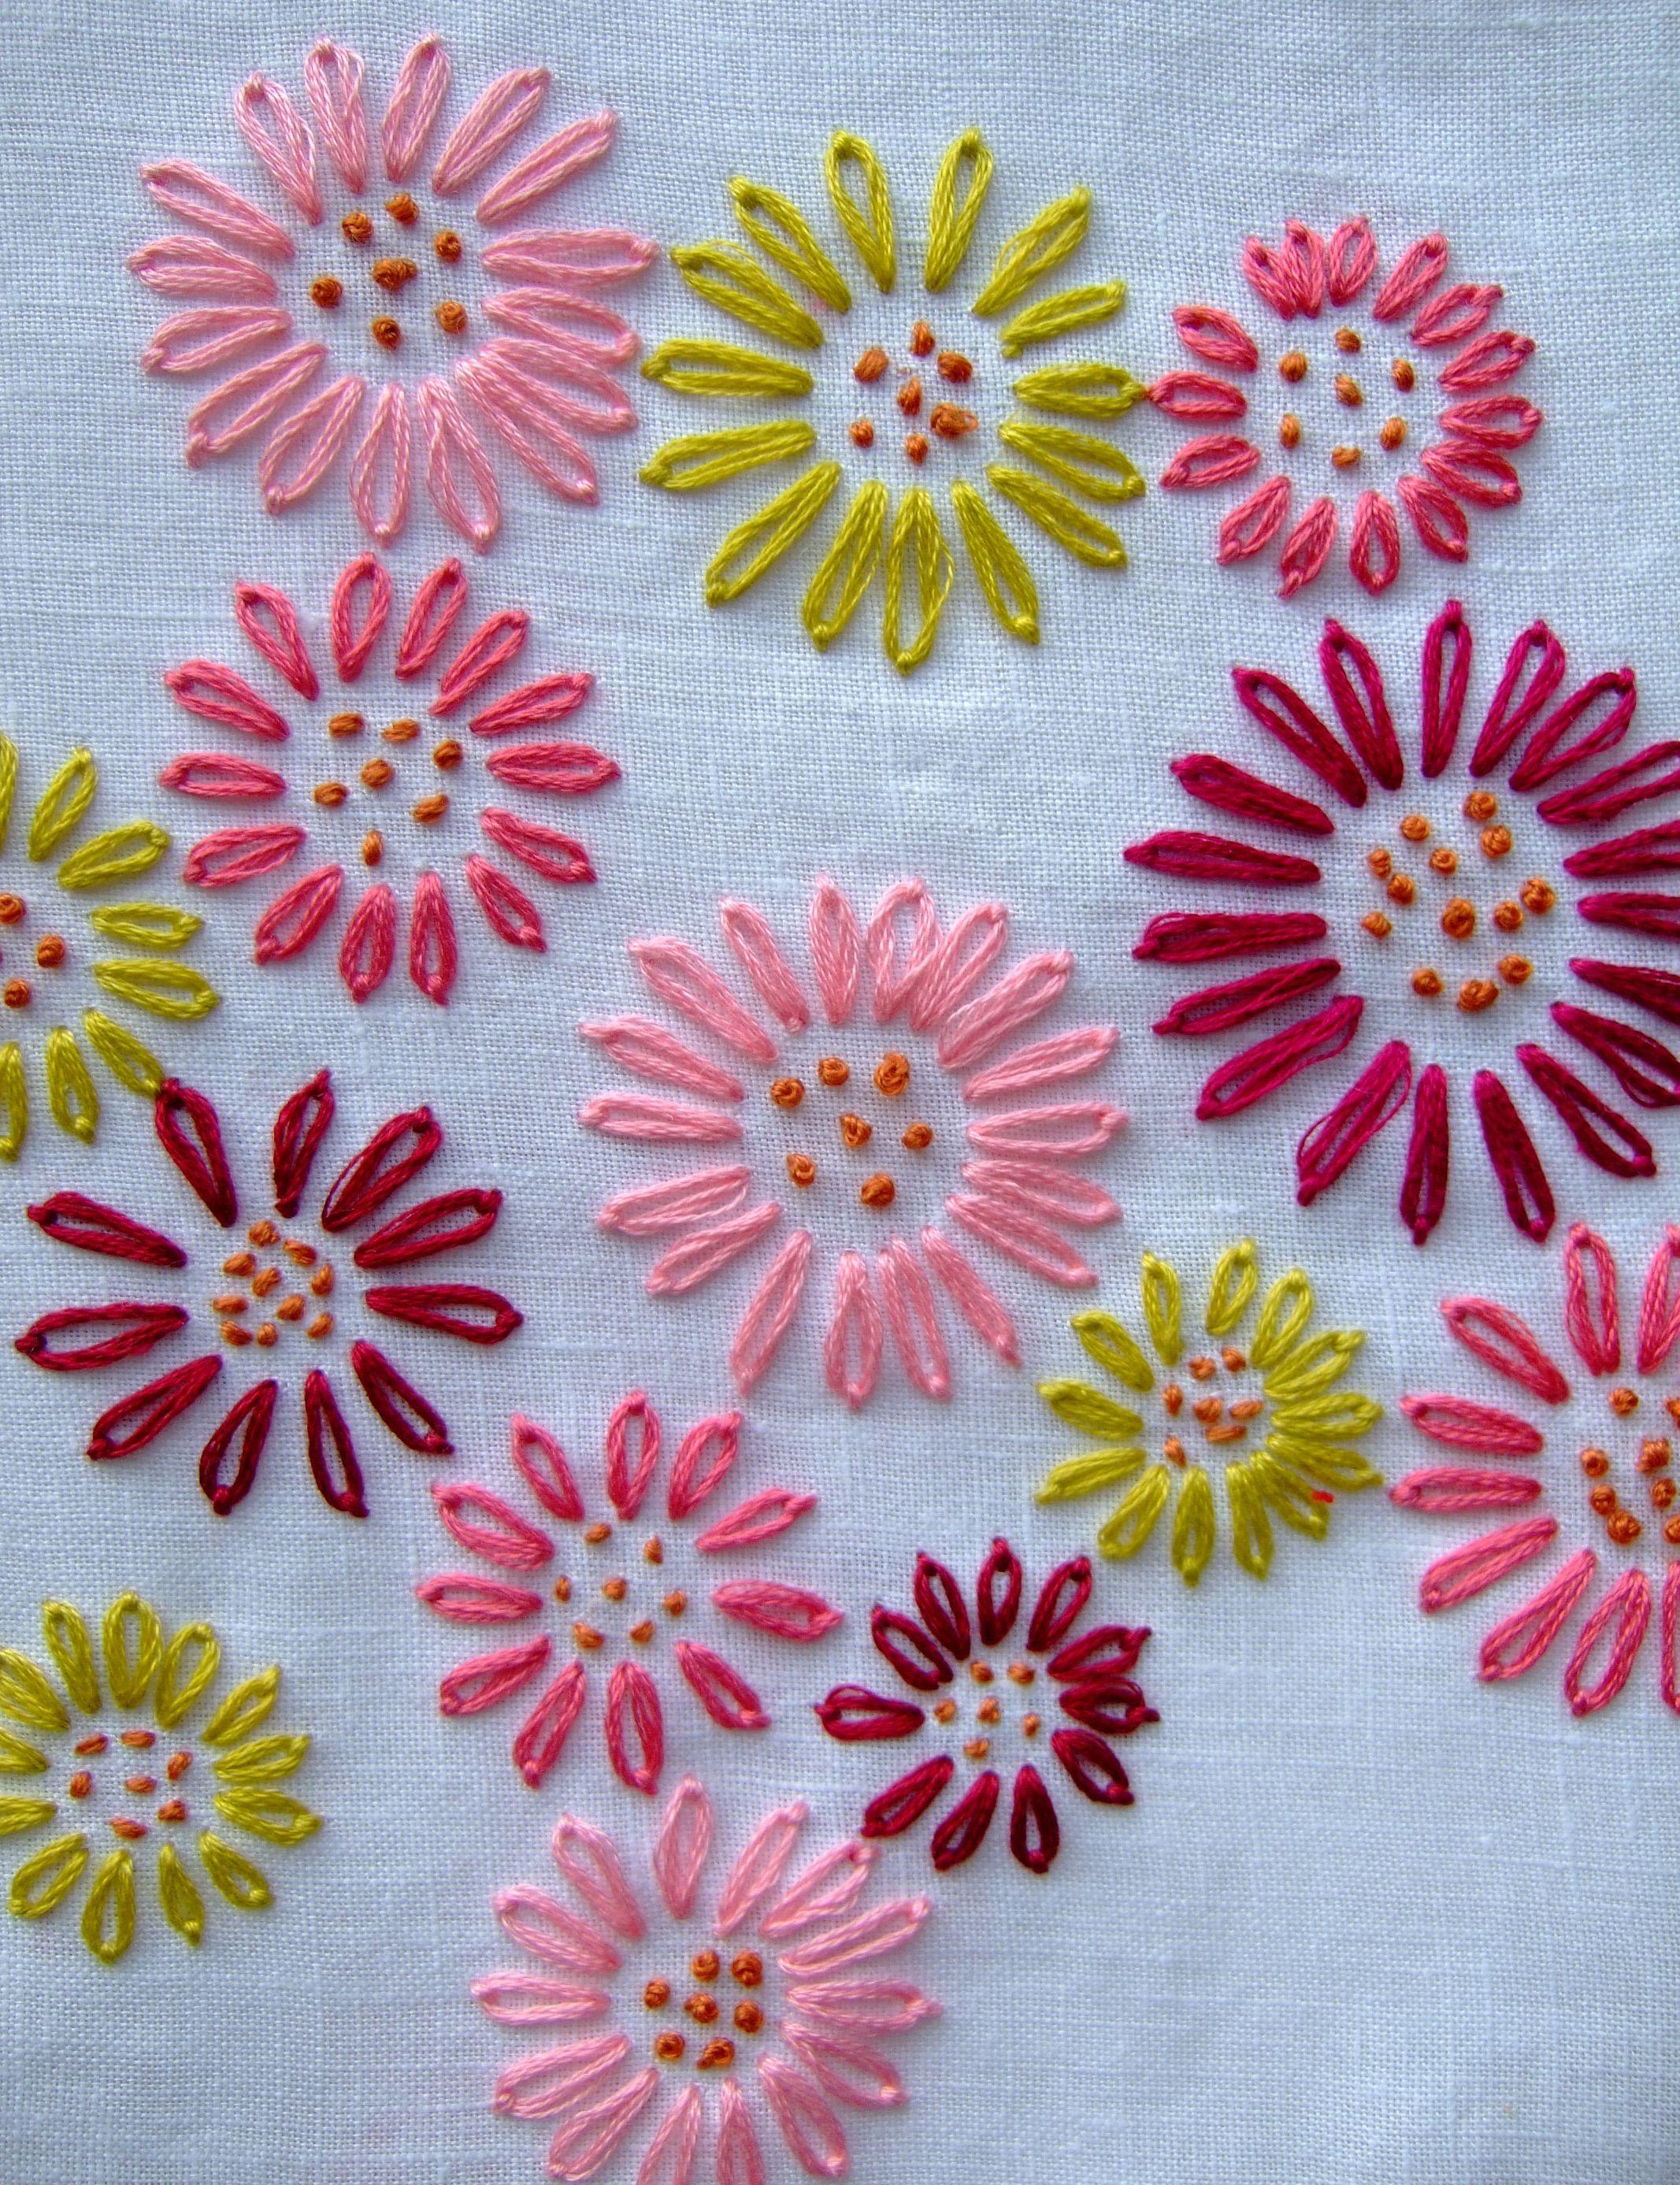 Embroidered Flowers From Jane Brocket El Nakisi Pinterest